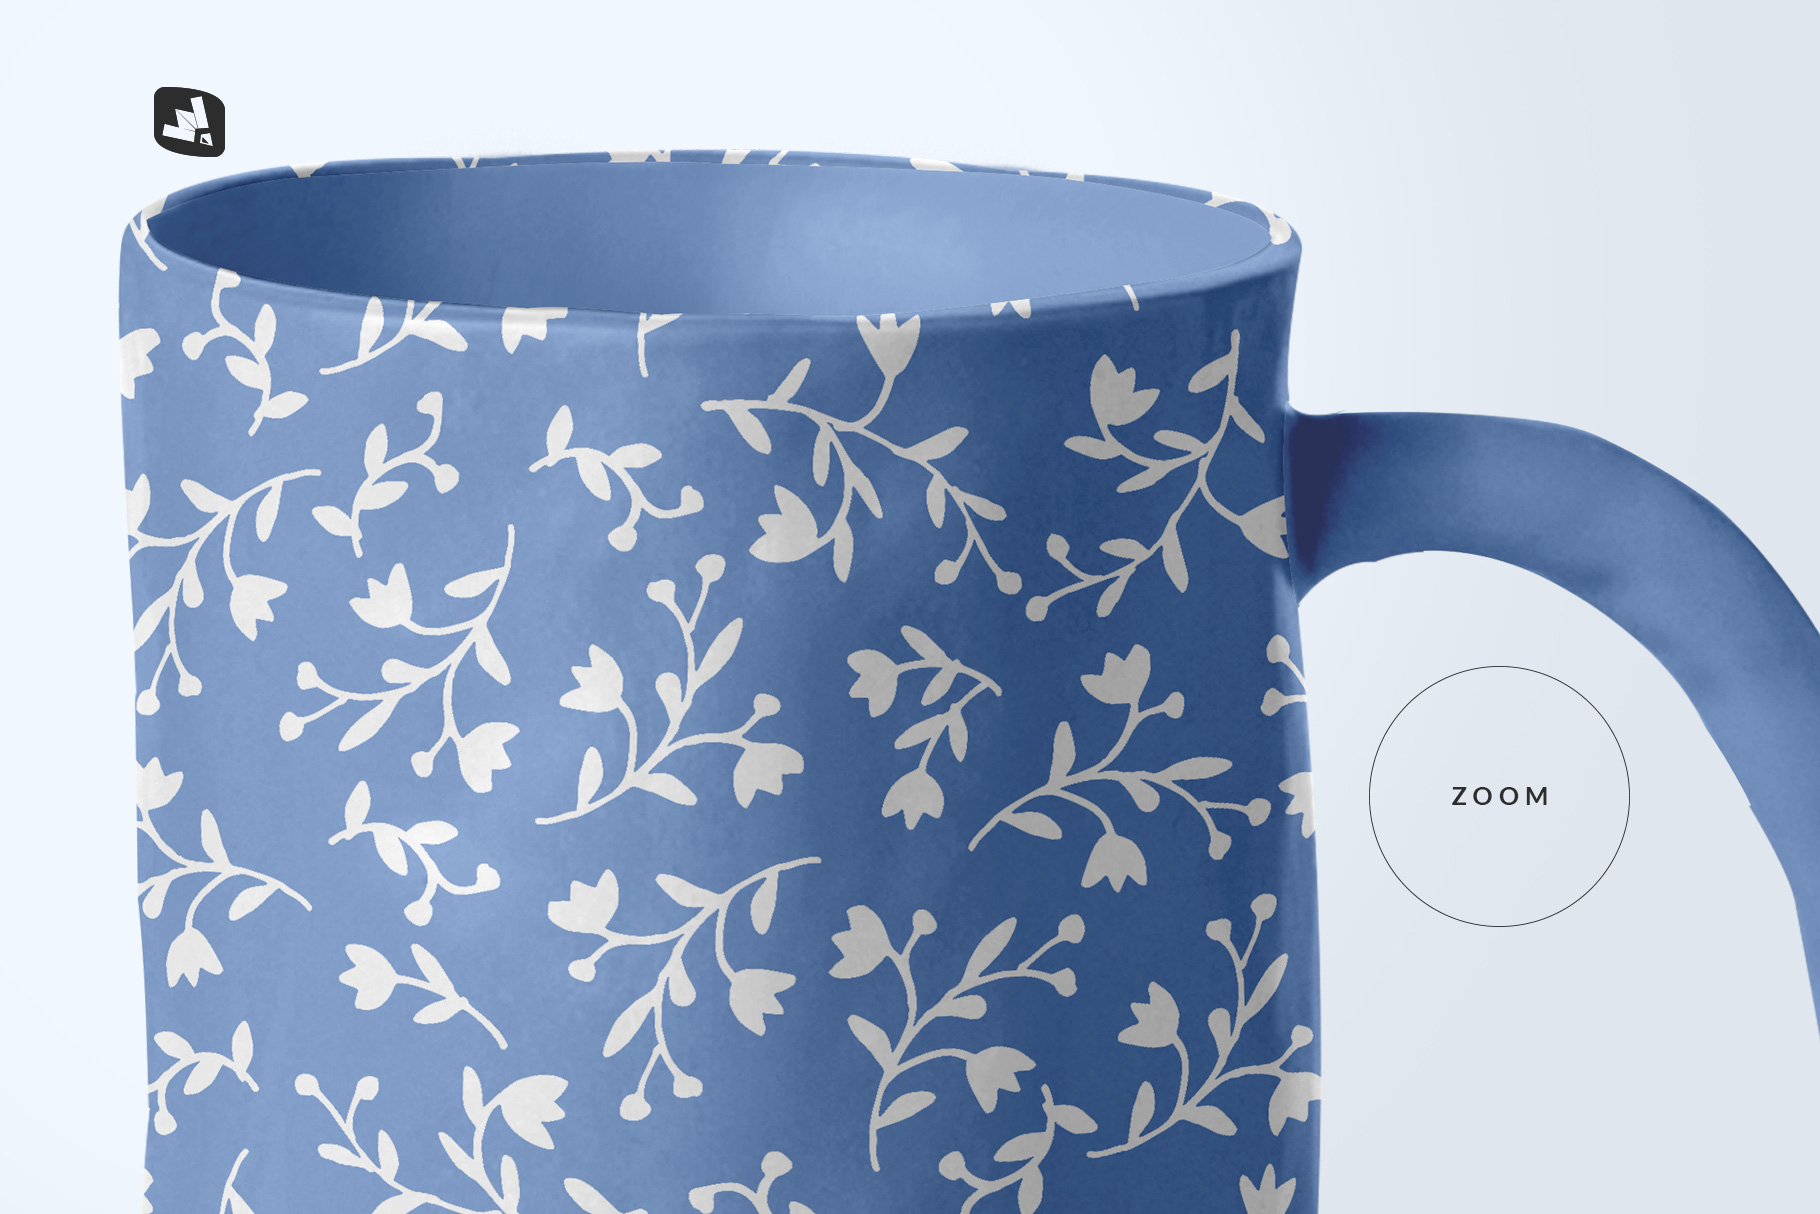 zoomed in image of the ceramic jug set mockup